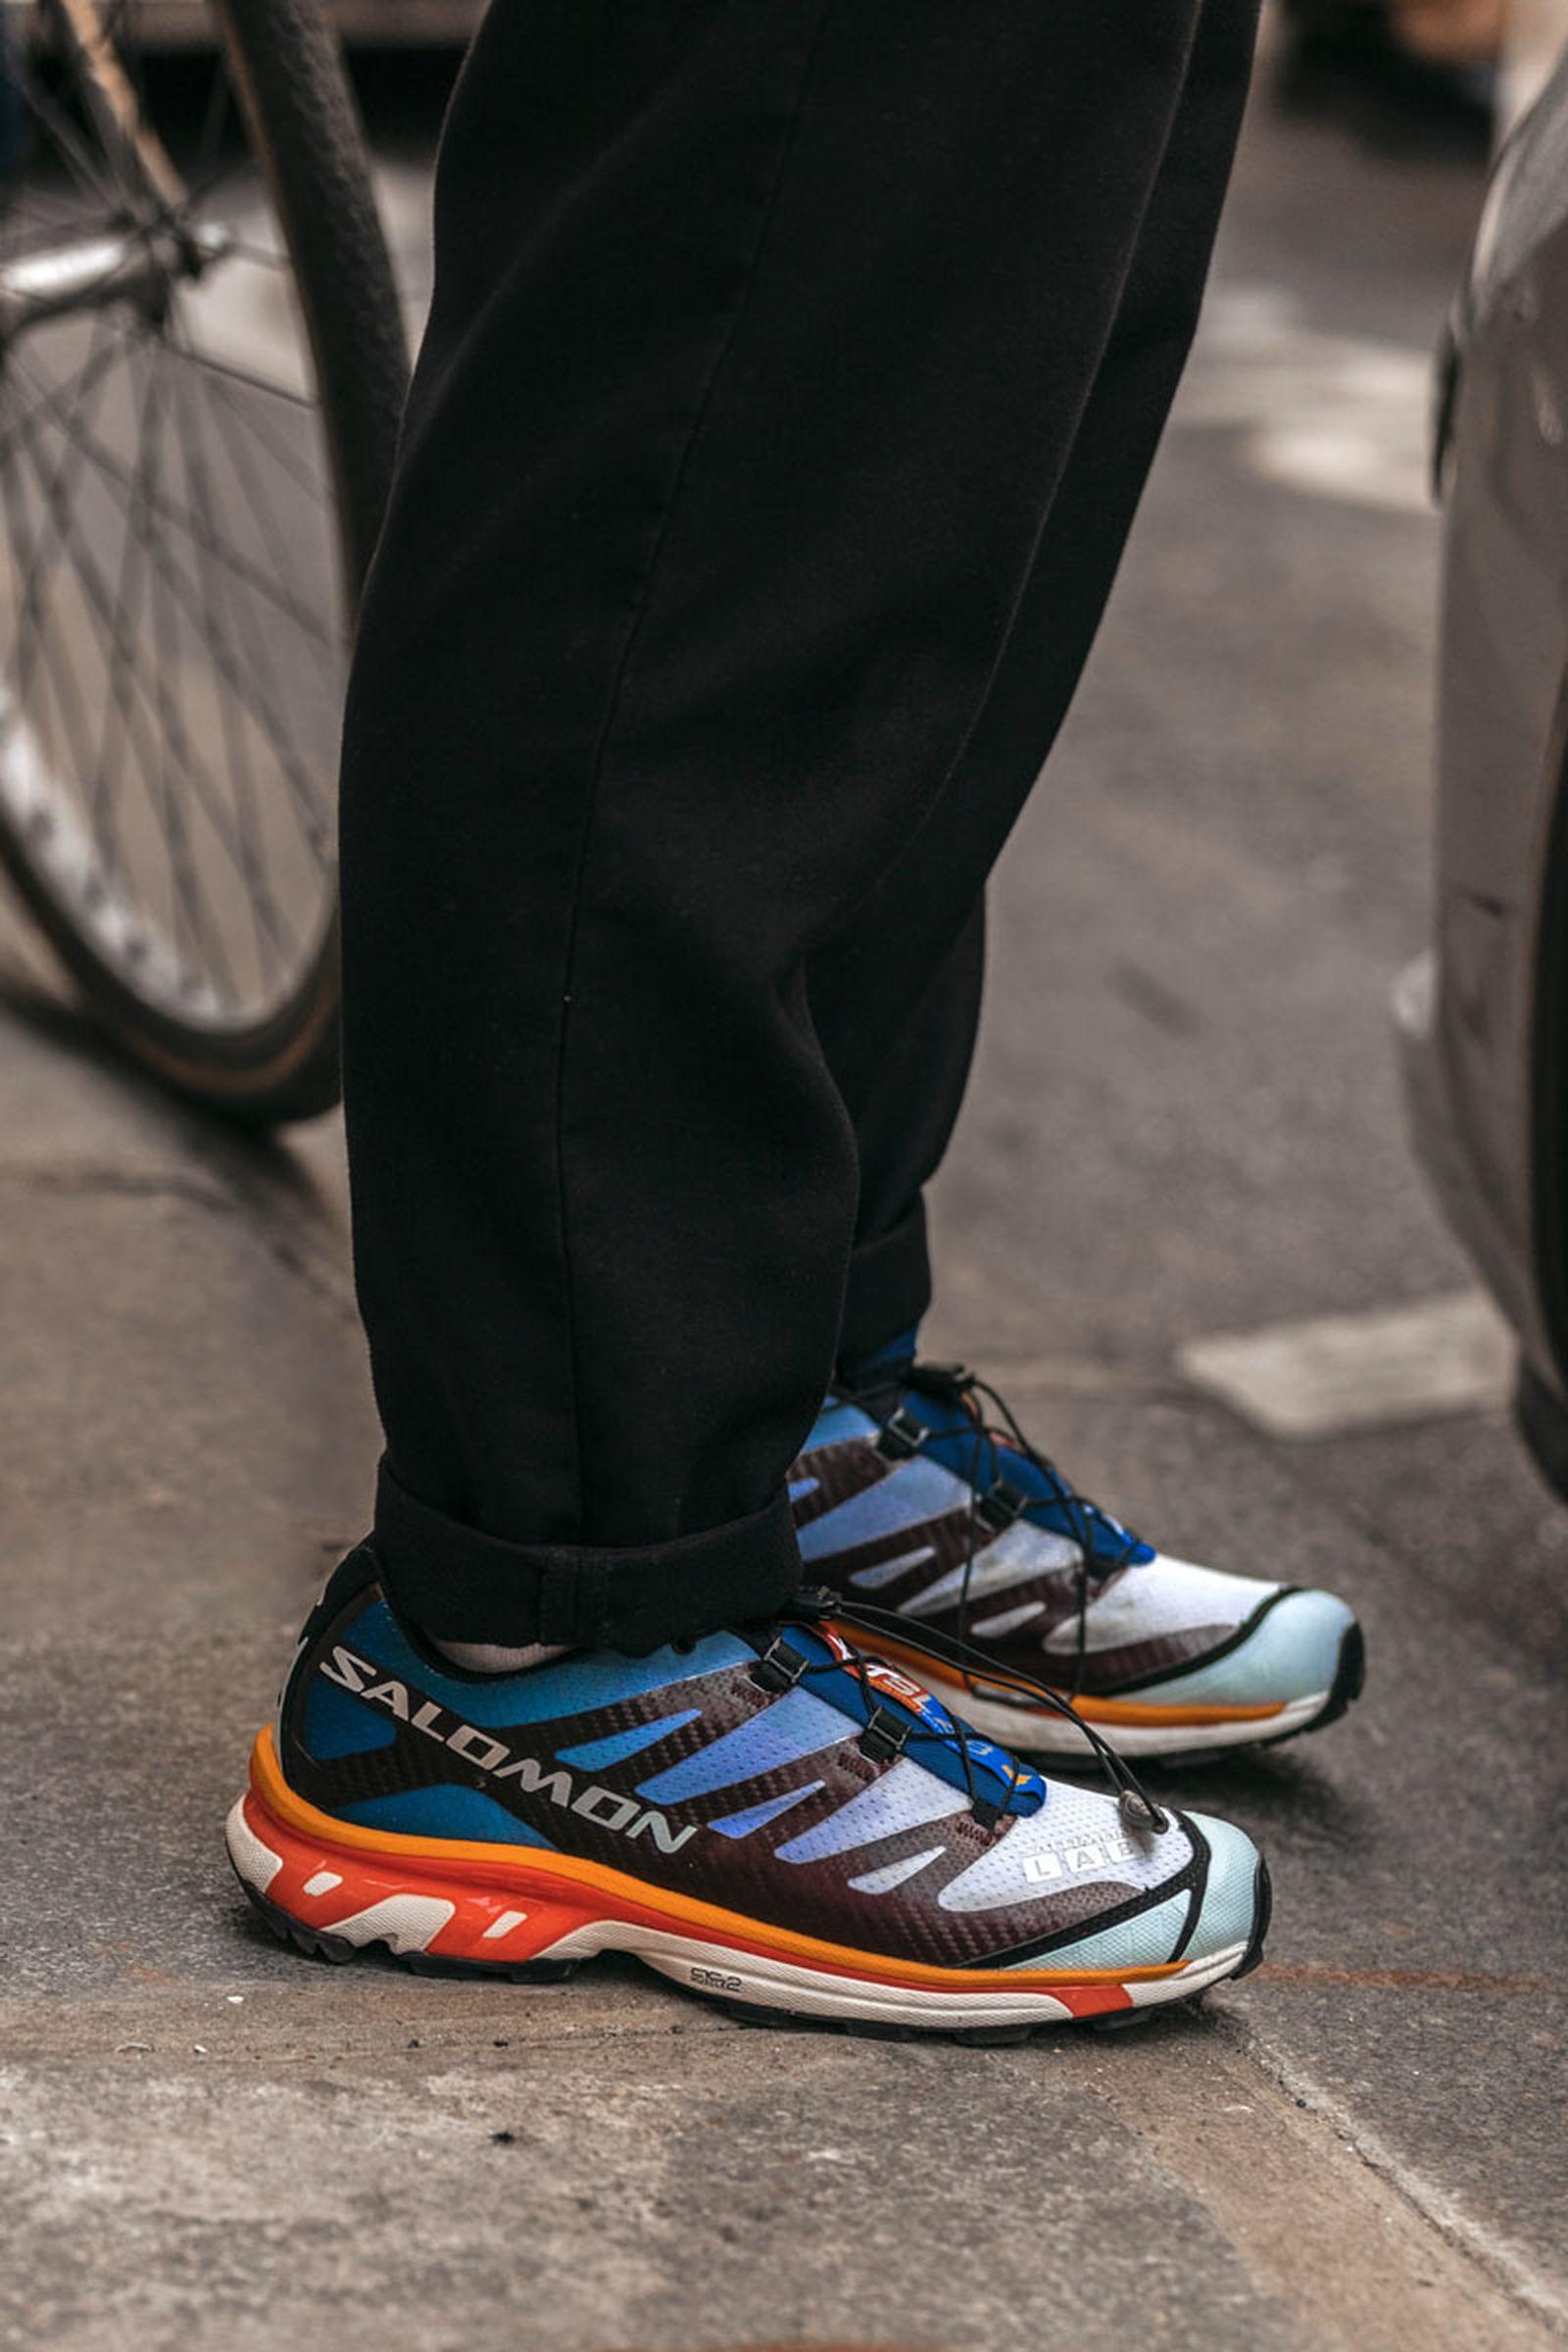 paris fashion week ss20 sneakers 016 Nike comme des garcons li ning